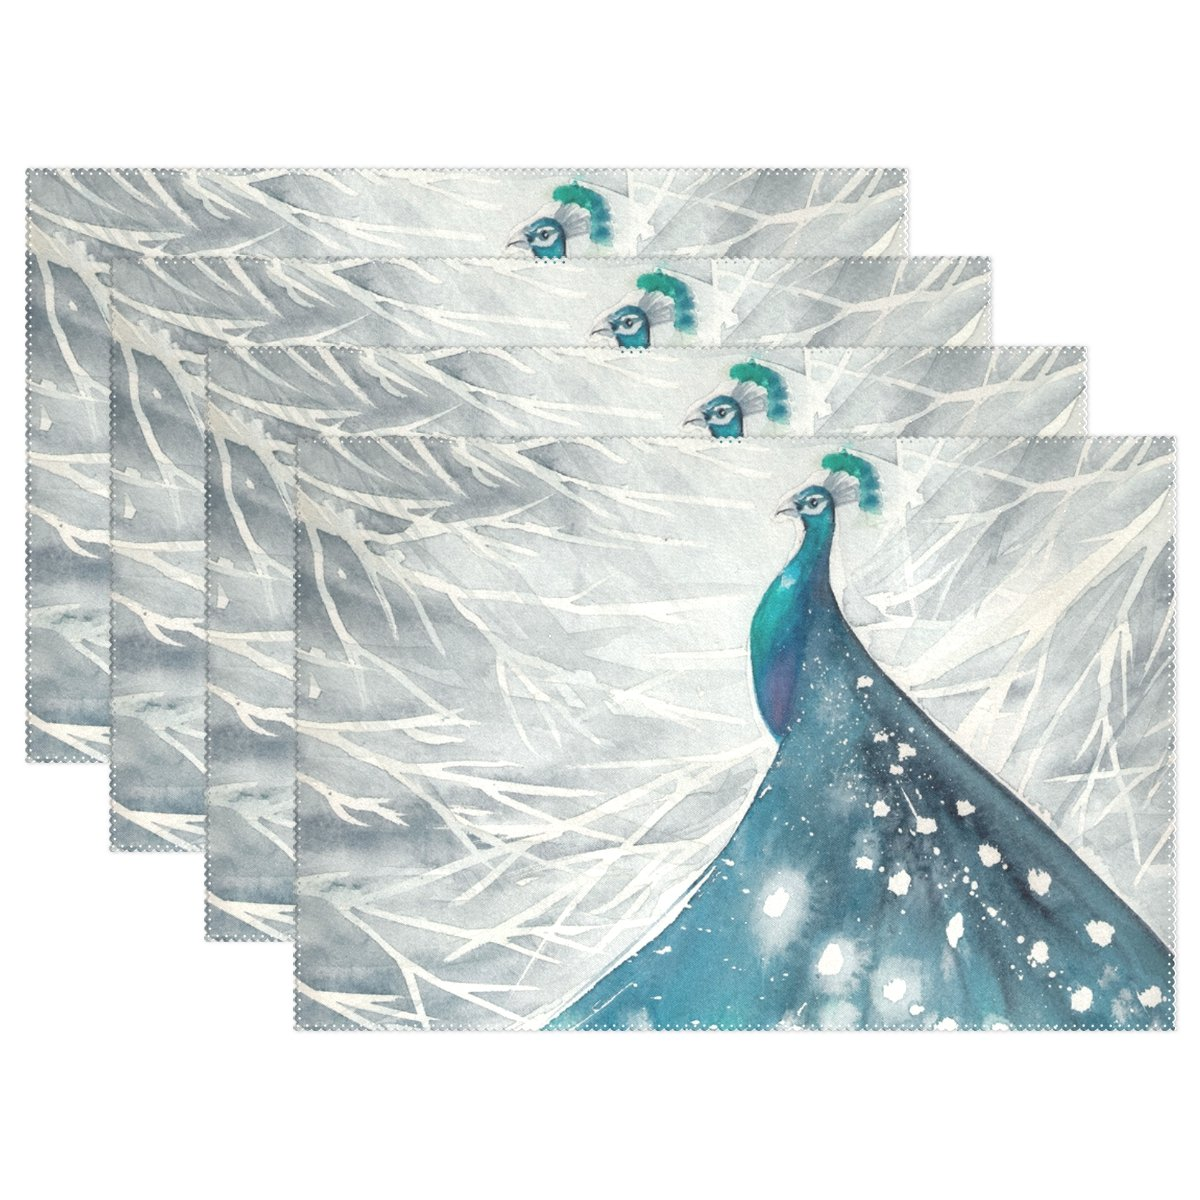 Ethel Ernest Amazing Bird Peacock As Night Sky Over City耐熱プレースマット、ポリエステルテーブルマットPlace Mat forキッチンダイニングルーム1 Piece 12x18x6 in 6  B075ZQS6KS